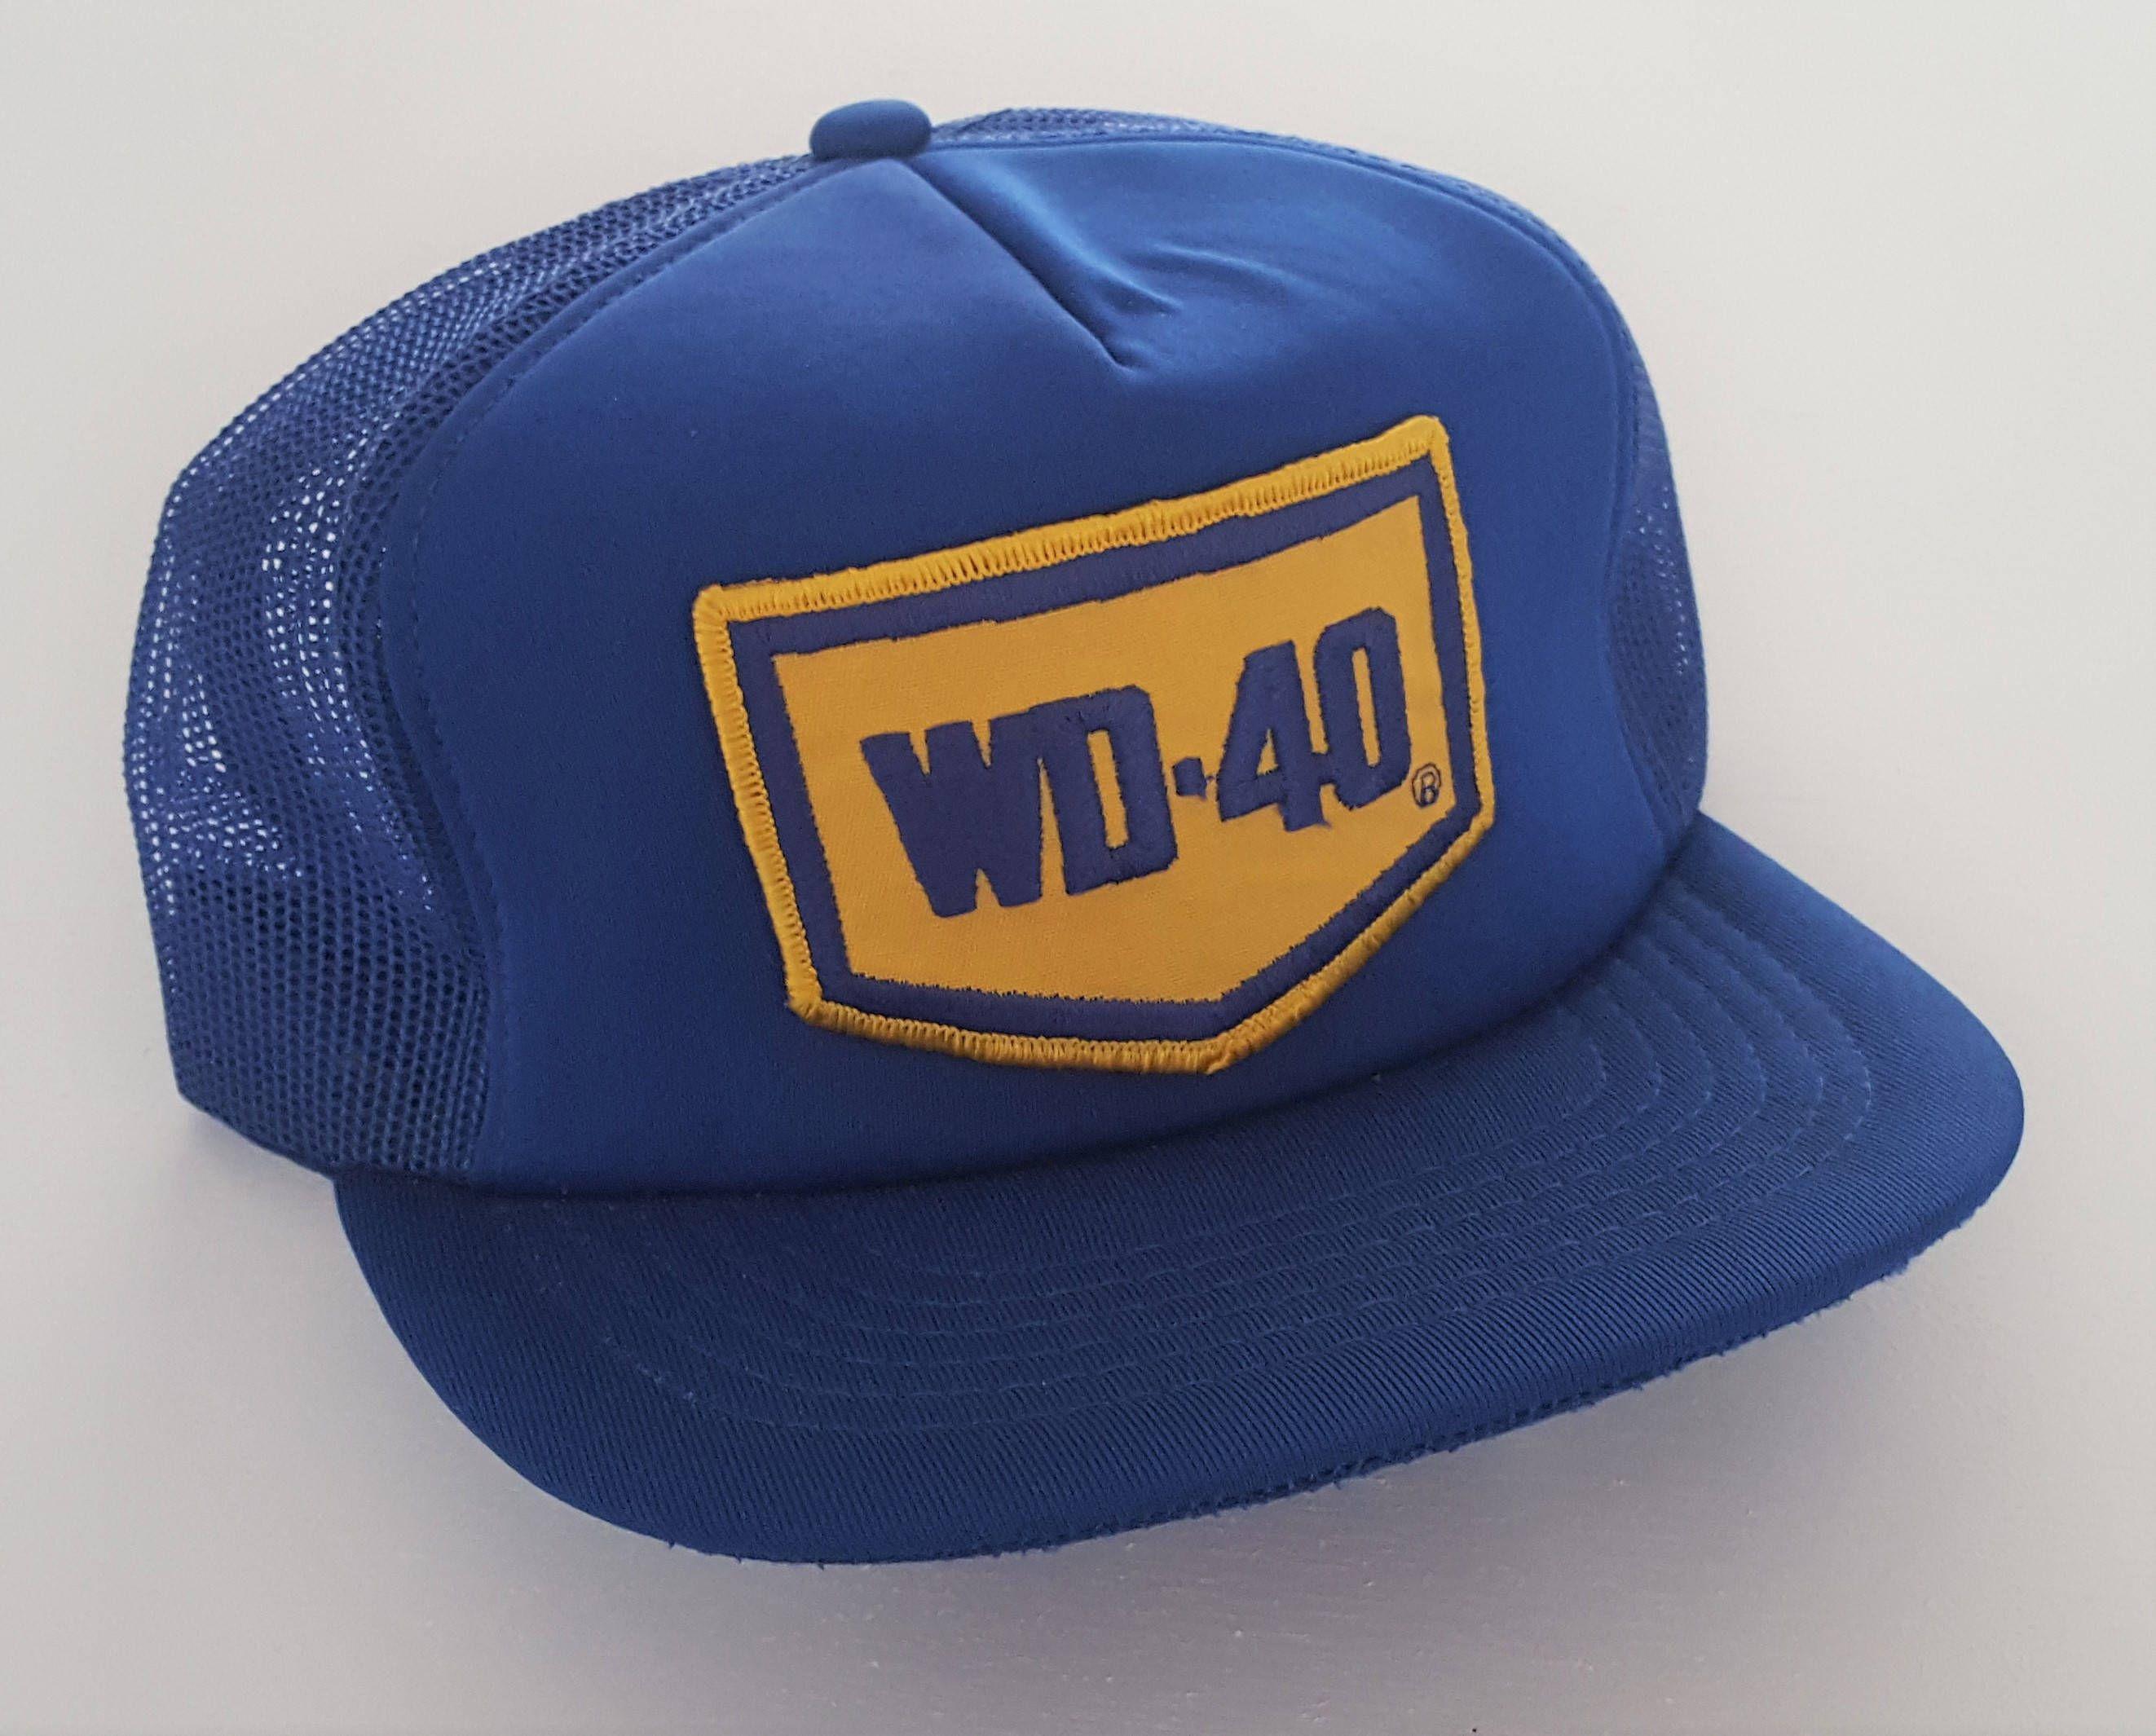 Vintage WD-40 Trucker Style Snapback Hat VTG by StreetwearAndVintage on Etsy 63a2353a8fd